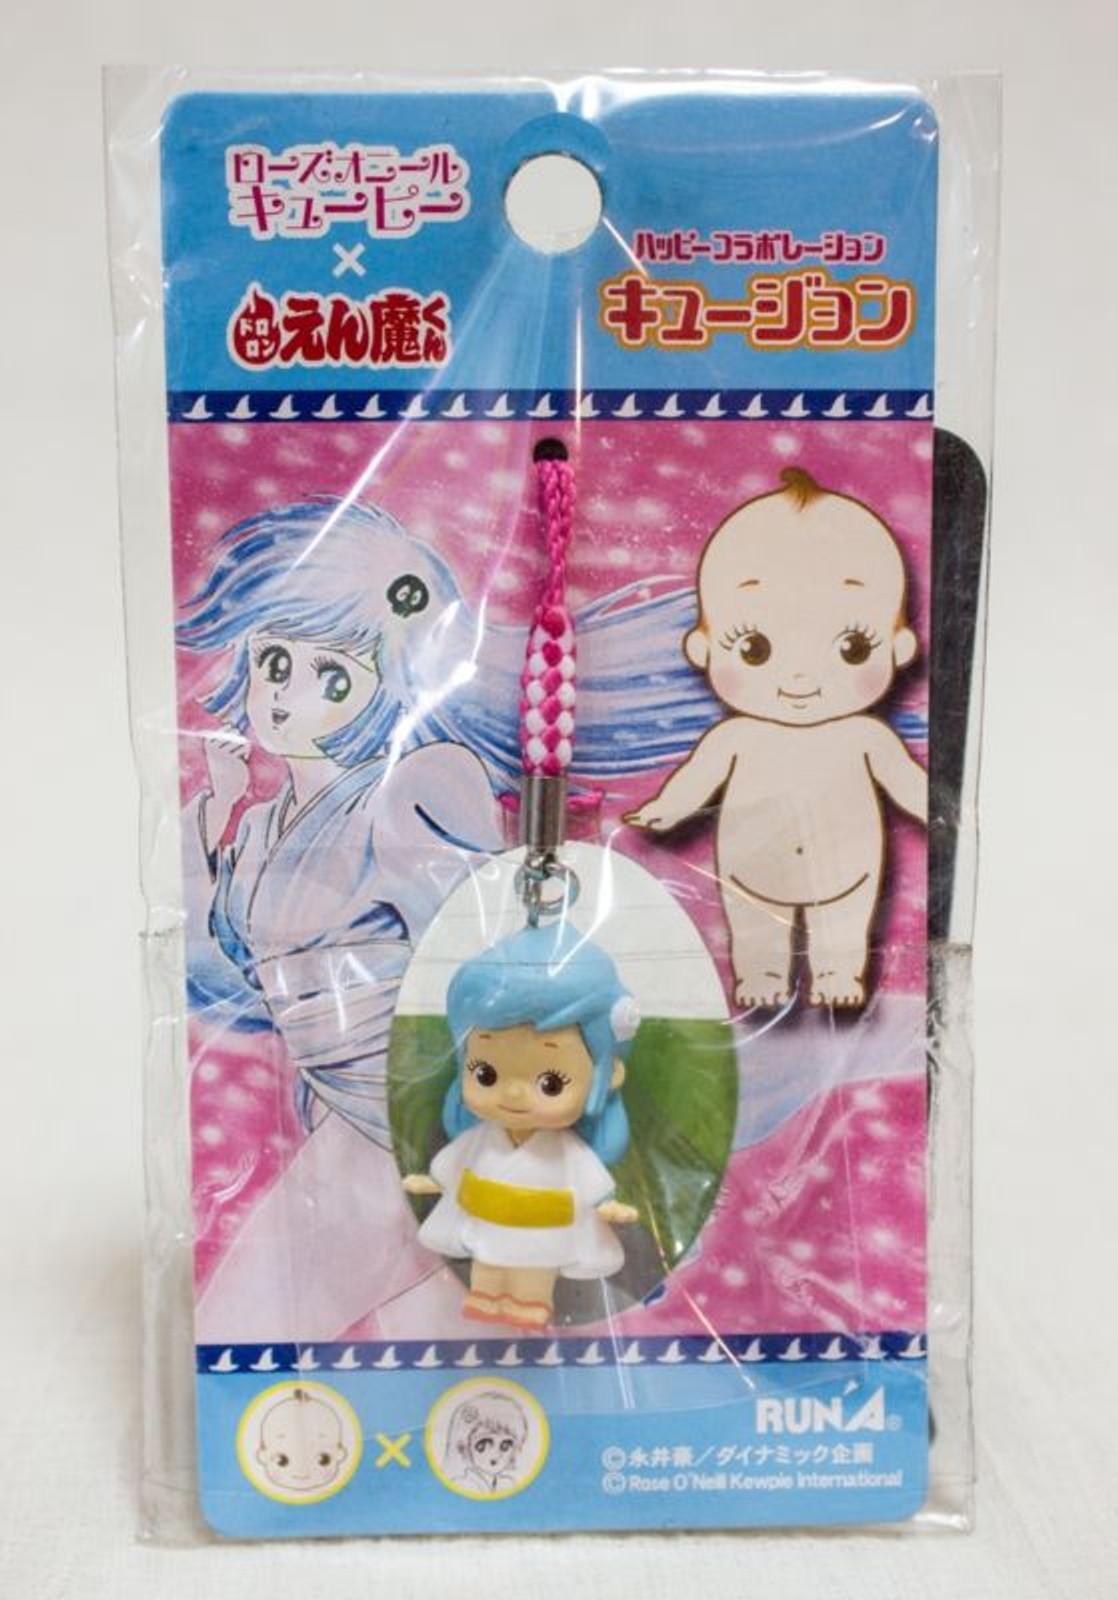 Dororon Enma-Kun Yukiko Hime Rose O'neill Kewpie Kewsion Figure Strap JAPAN ANIME